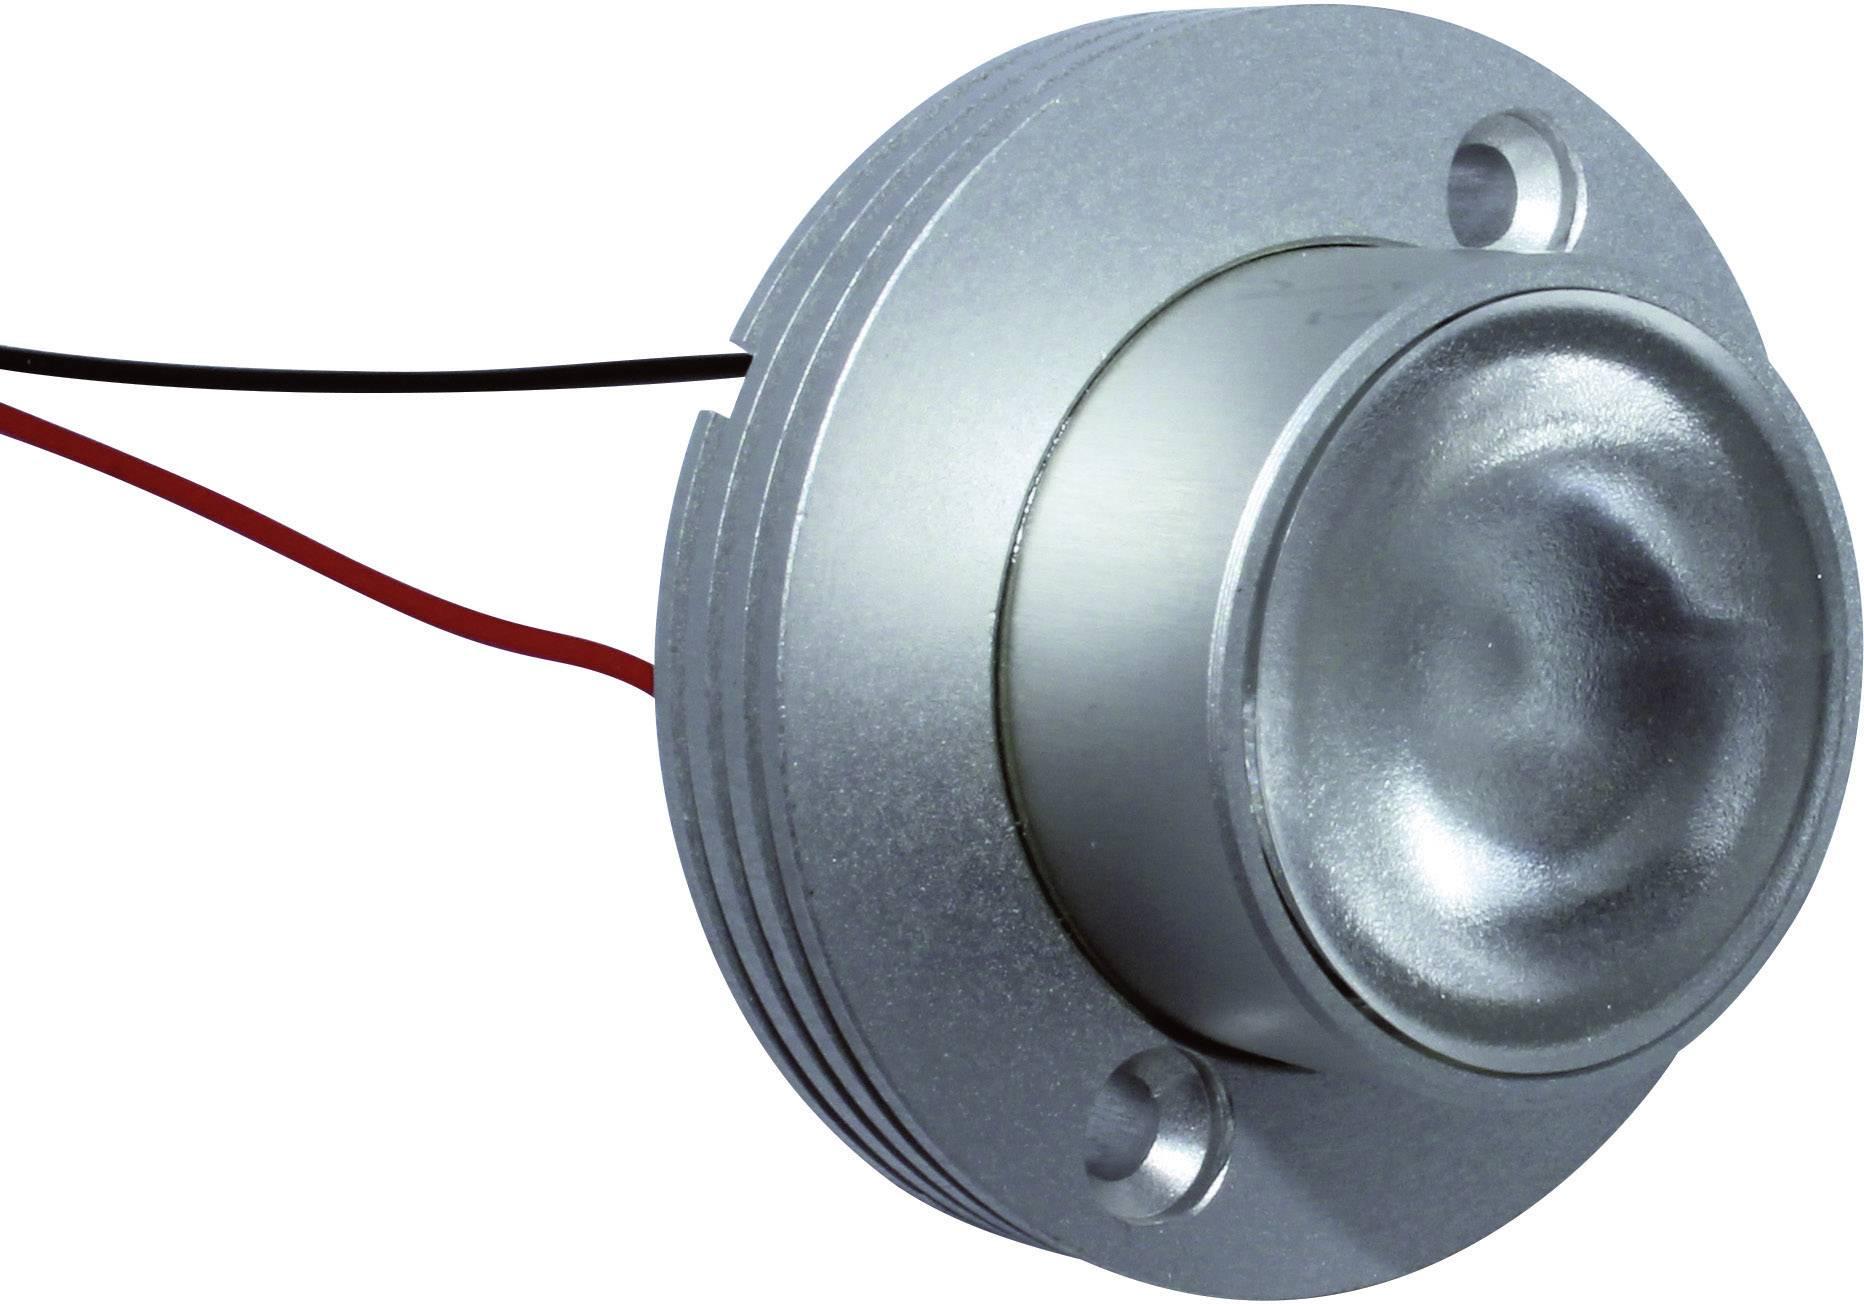 HighPower LED-spot Signal Construct QAUR1101L030, 15 °, 70 lm, 1 W, 2.3 V, červená